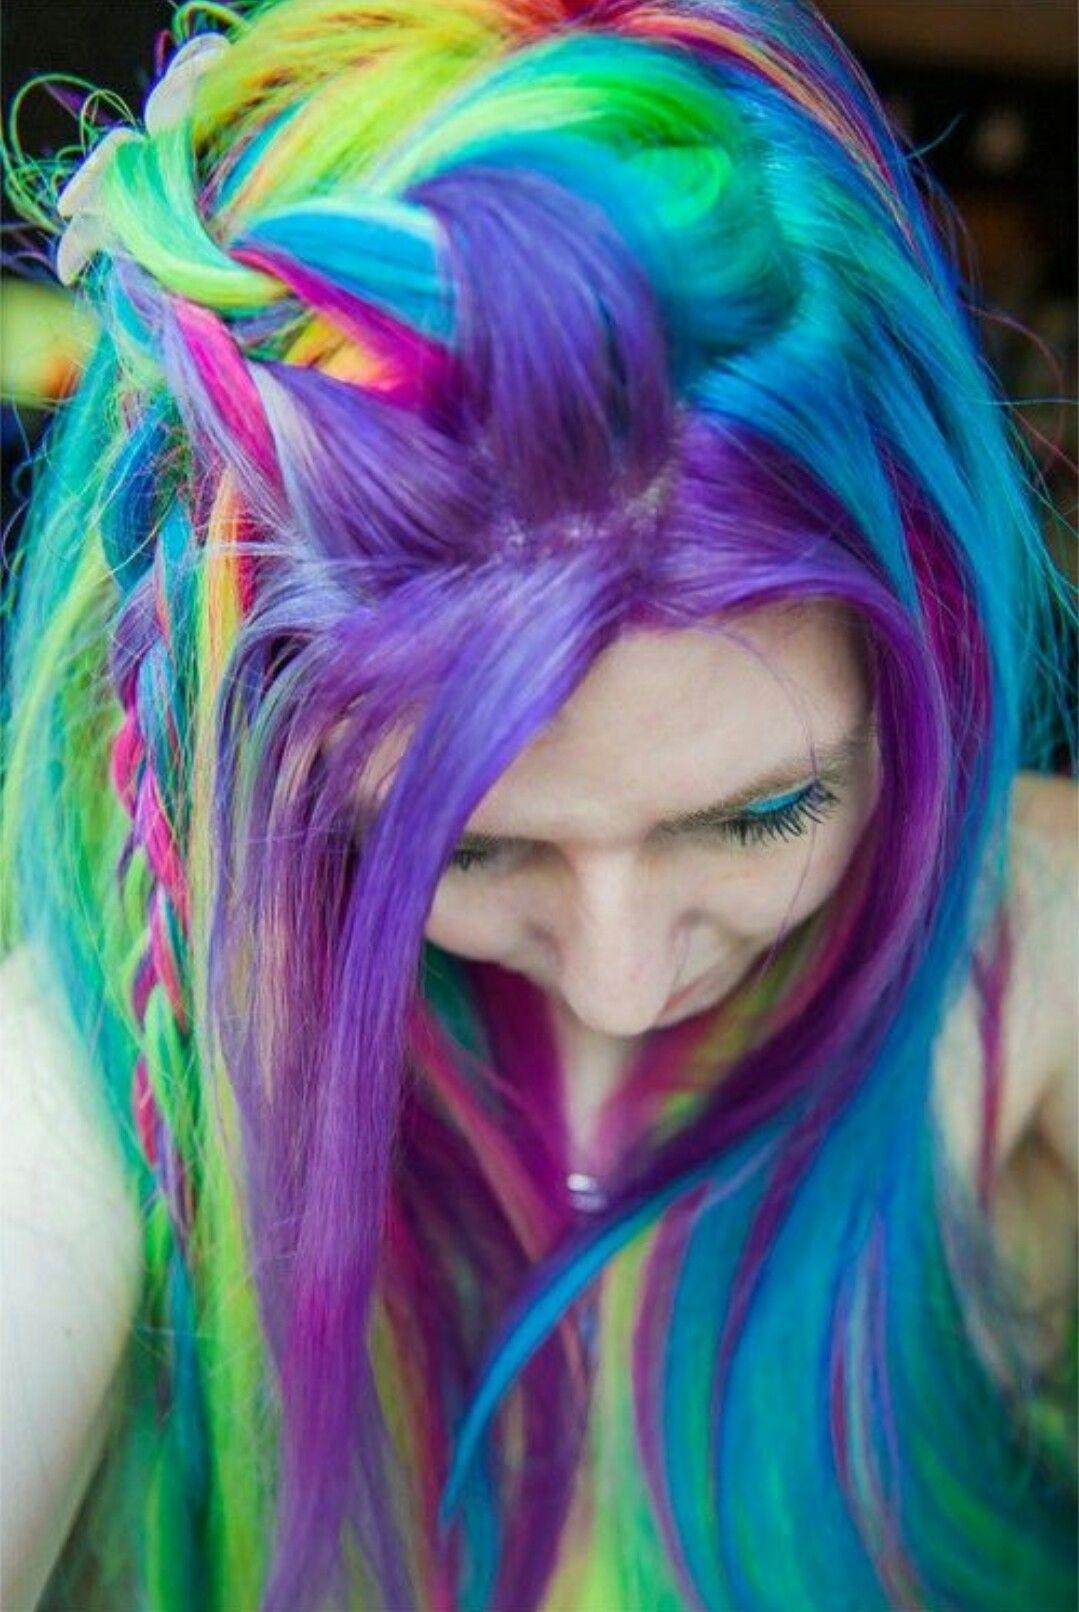 Image gallery mermaid hair -  Raimbowhair Greenhair Violethair Bluehair Yellowhair Pinkhair Purplehair Mermaidhair